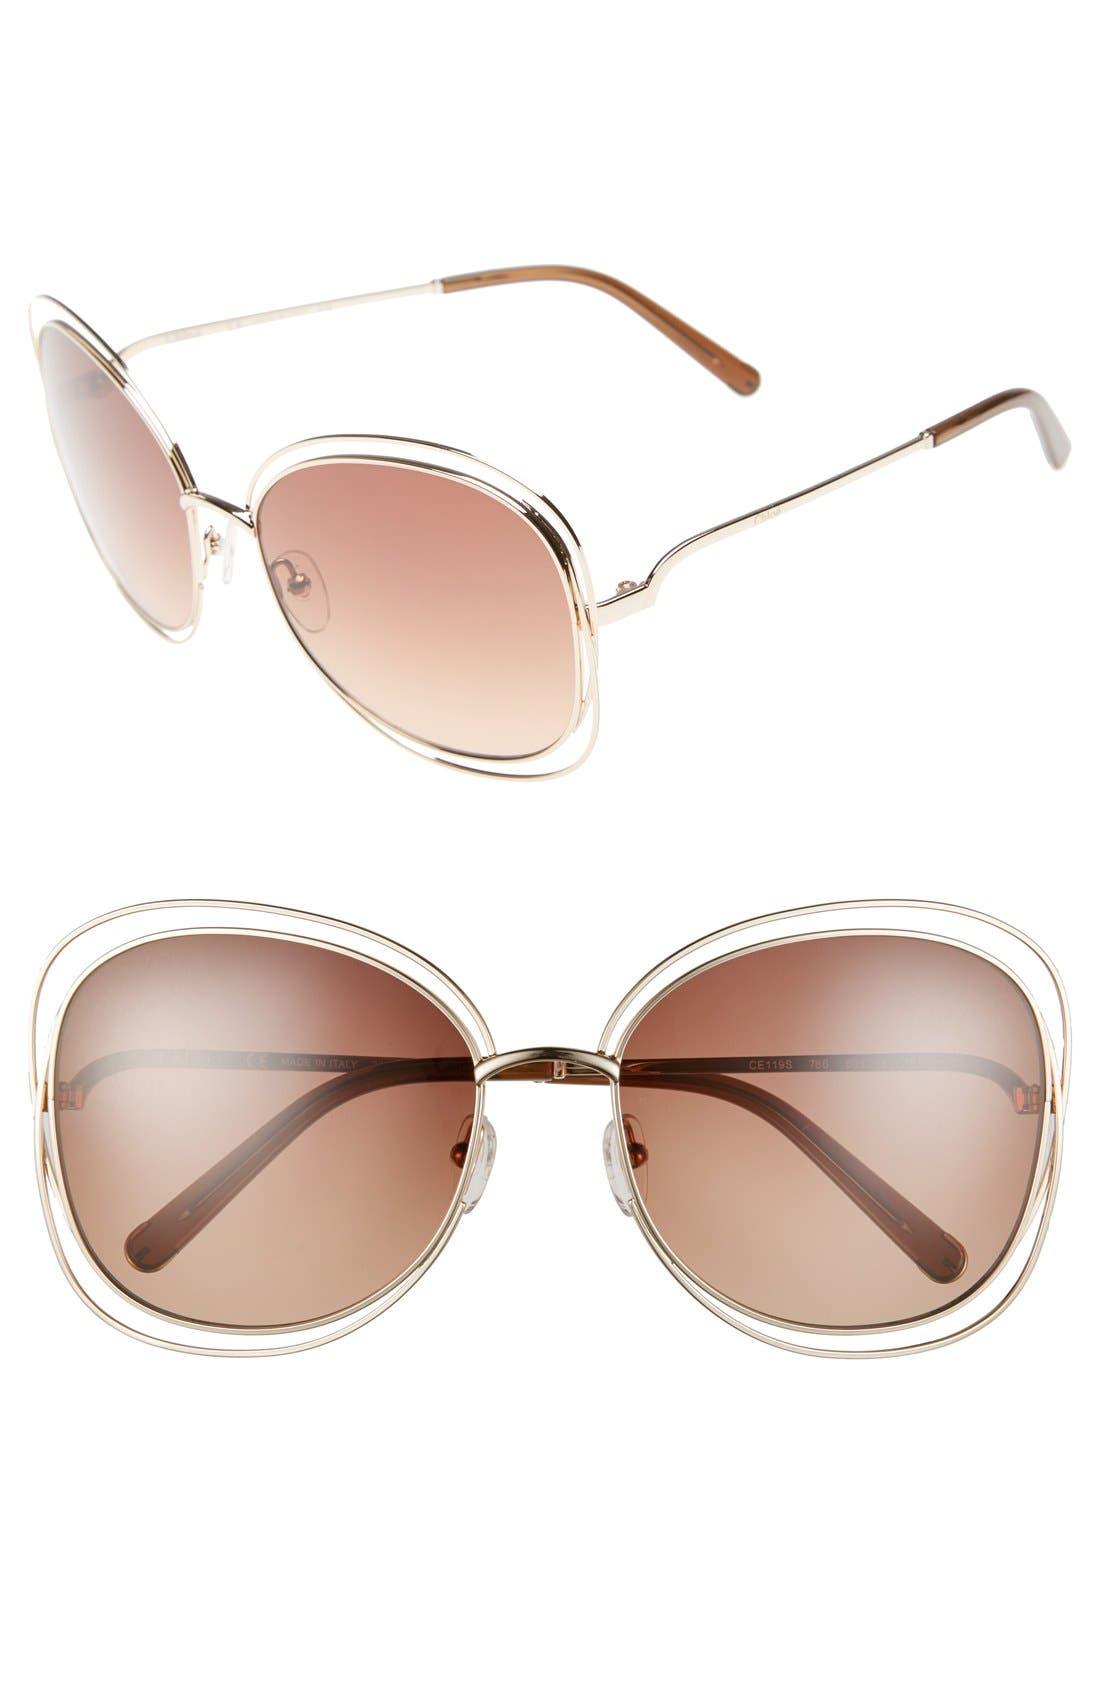 CHLOÉ, Carlina 60mm Gradient Les Sunglasses, Main thumbnail 1, color, ROSE GOLD/ BROWN